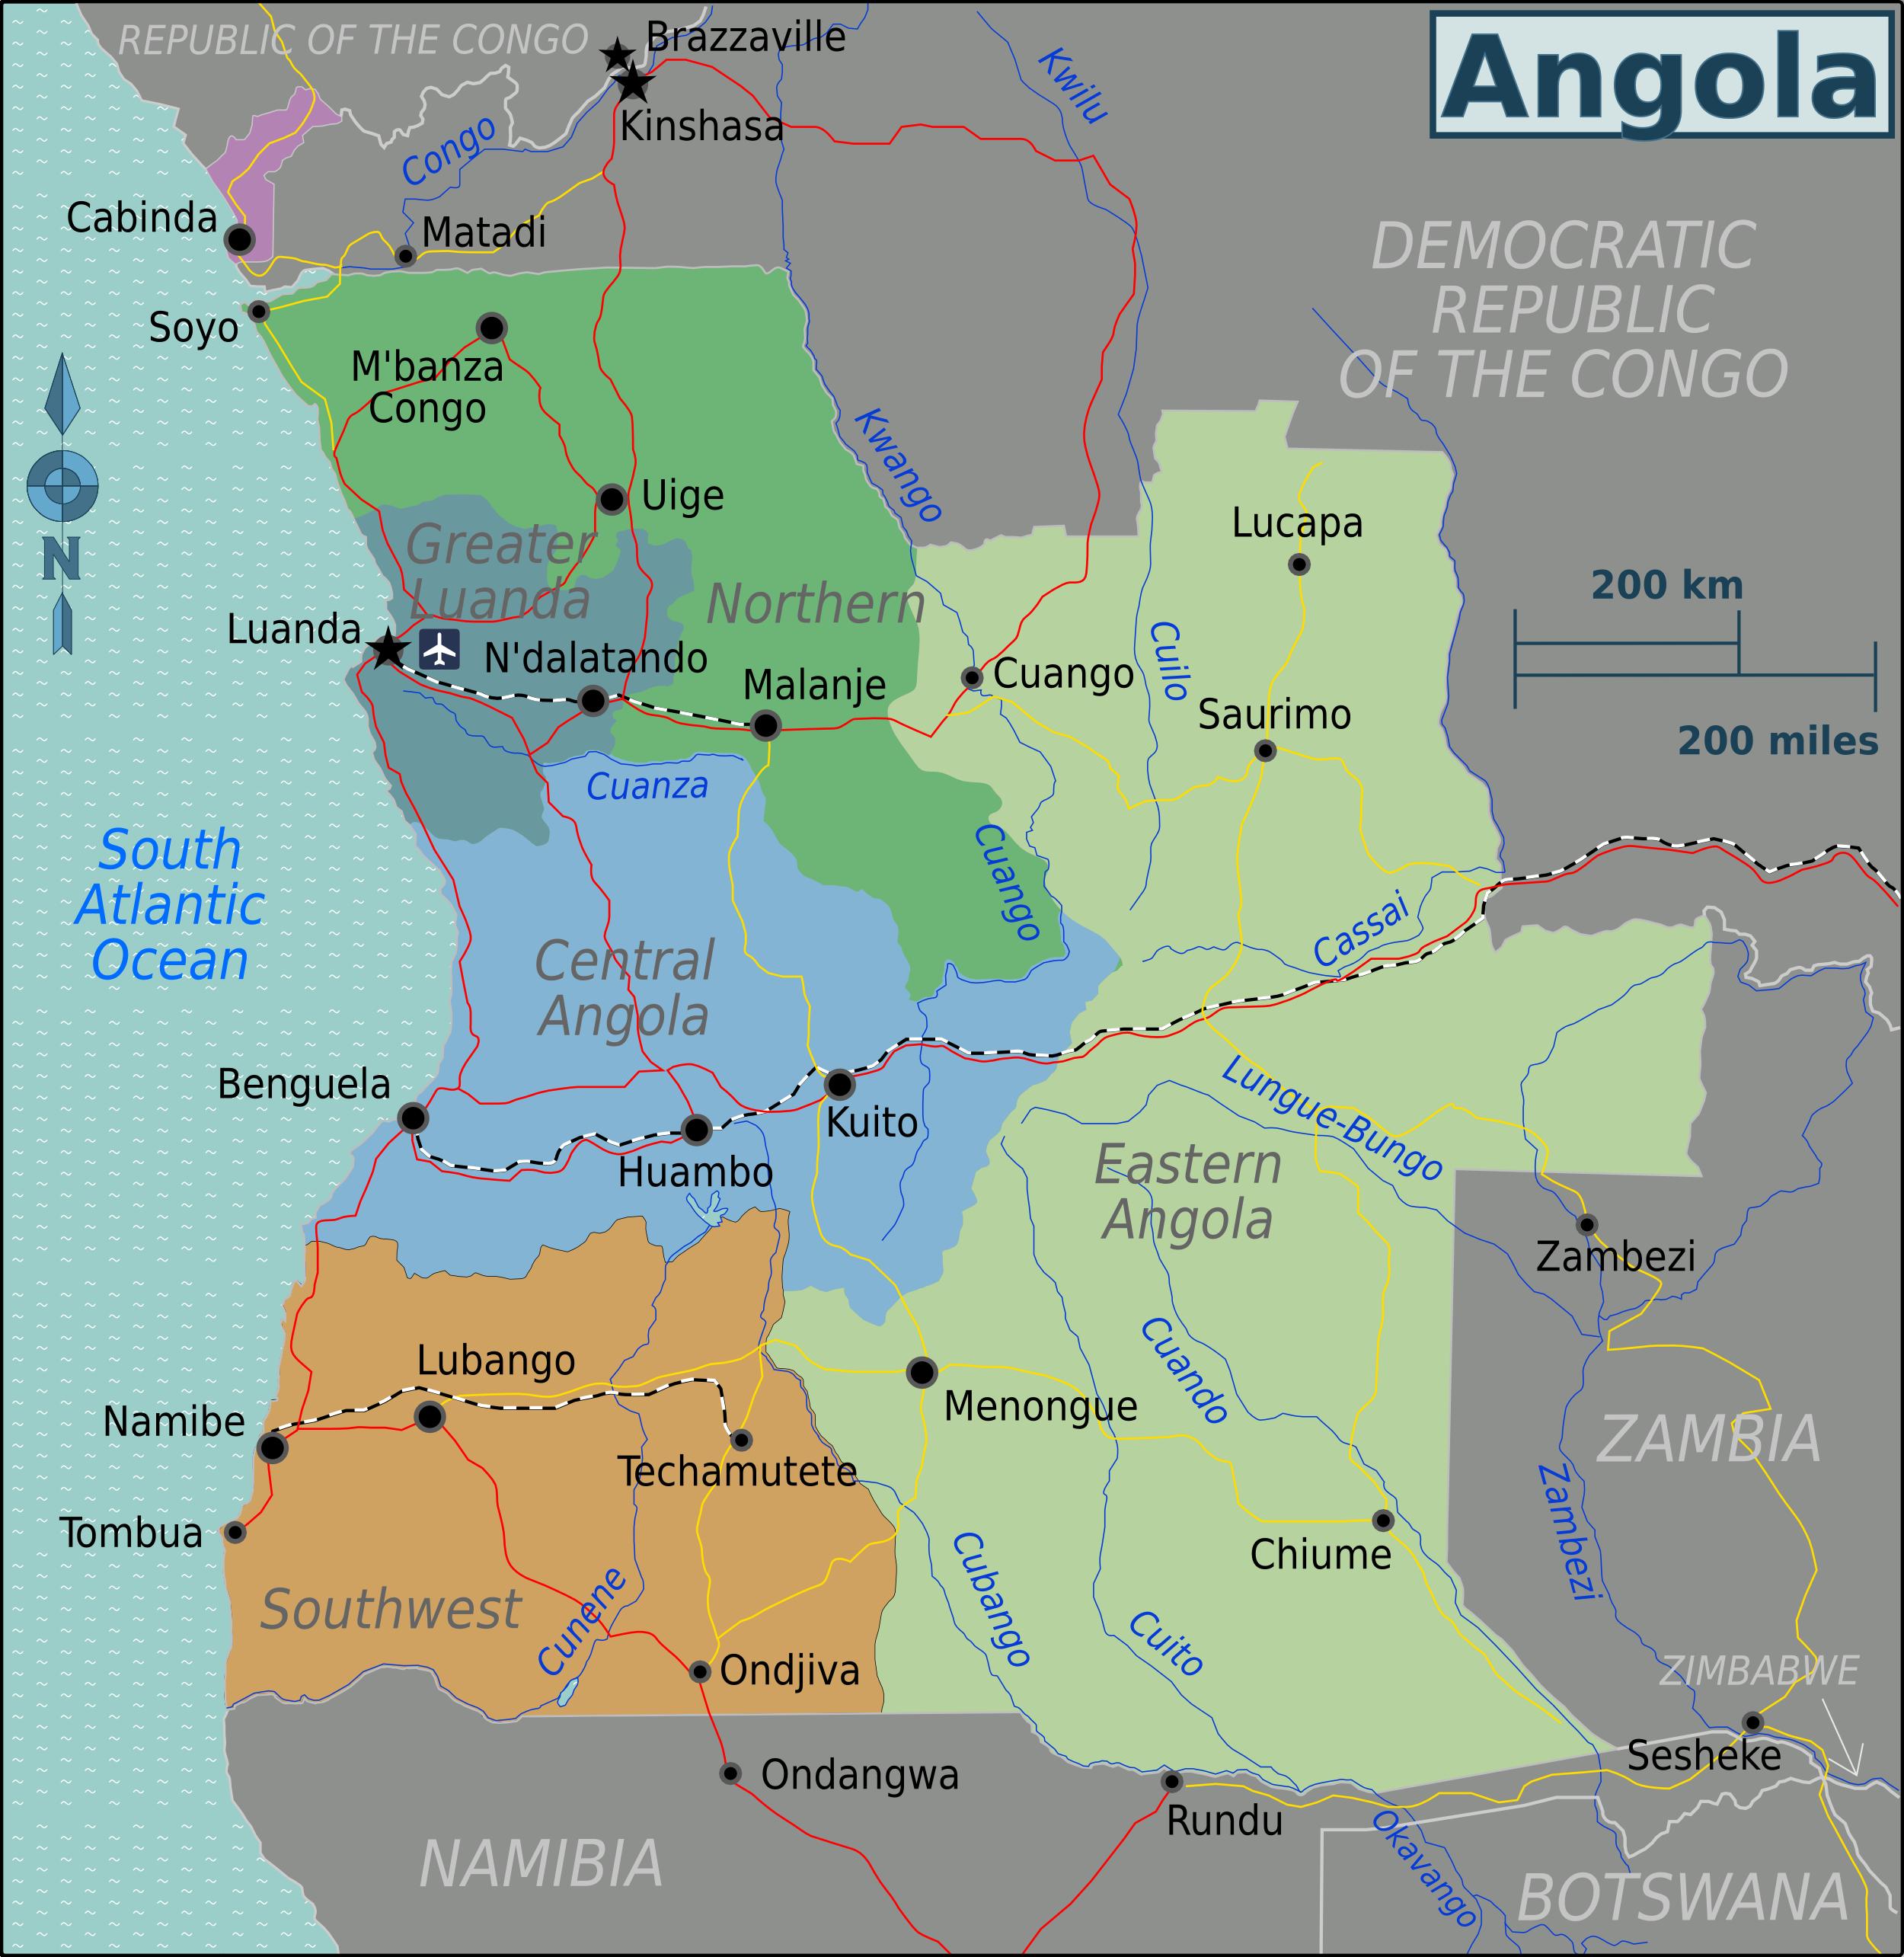 FileAngola Regions Mappng Wikimedia Commons - Angola map